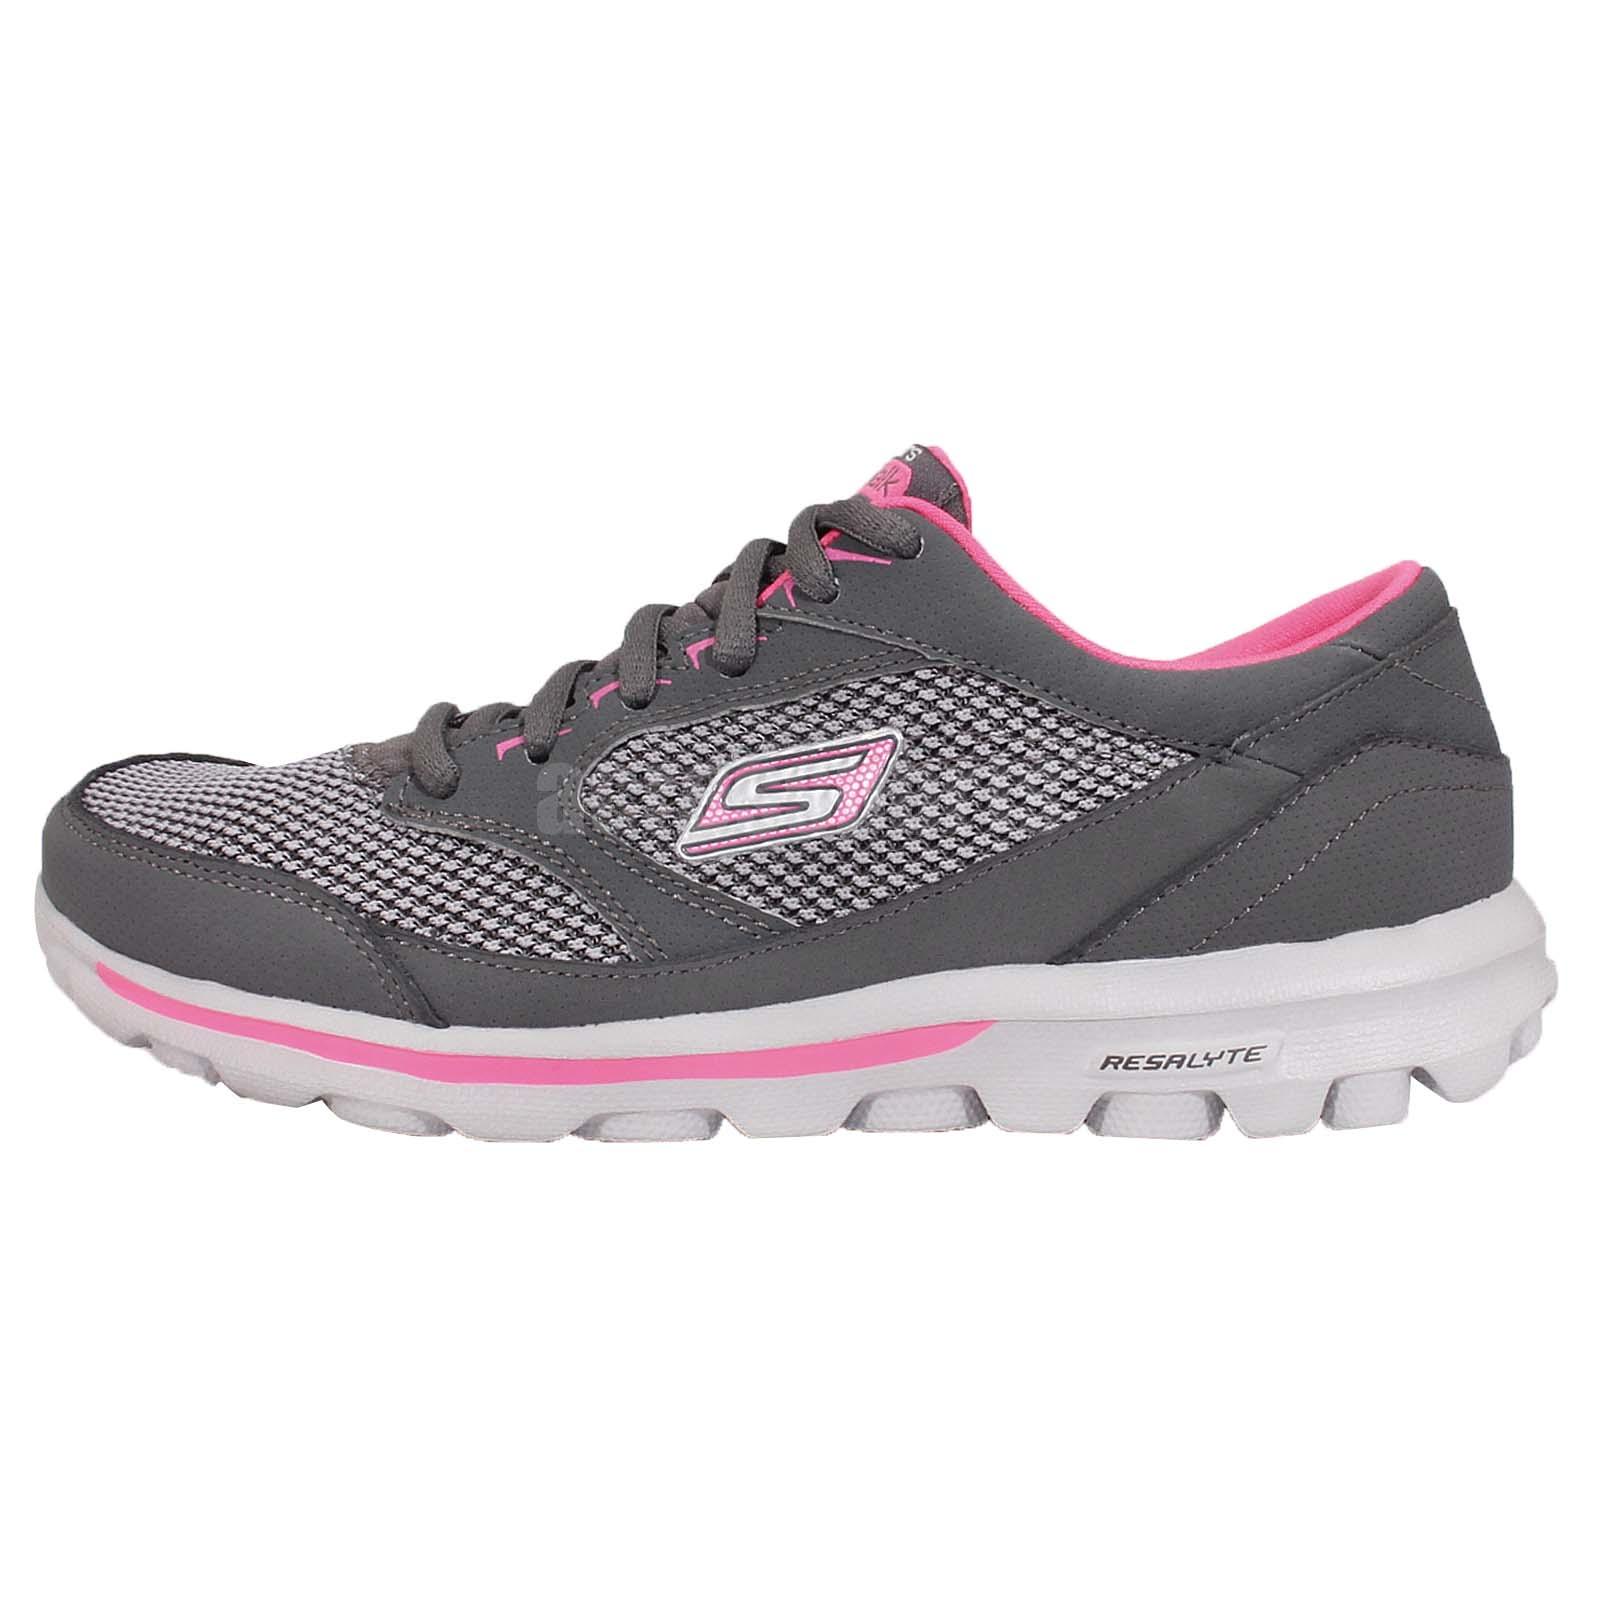 skechers go walk resalyte grey pink womens walking running